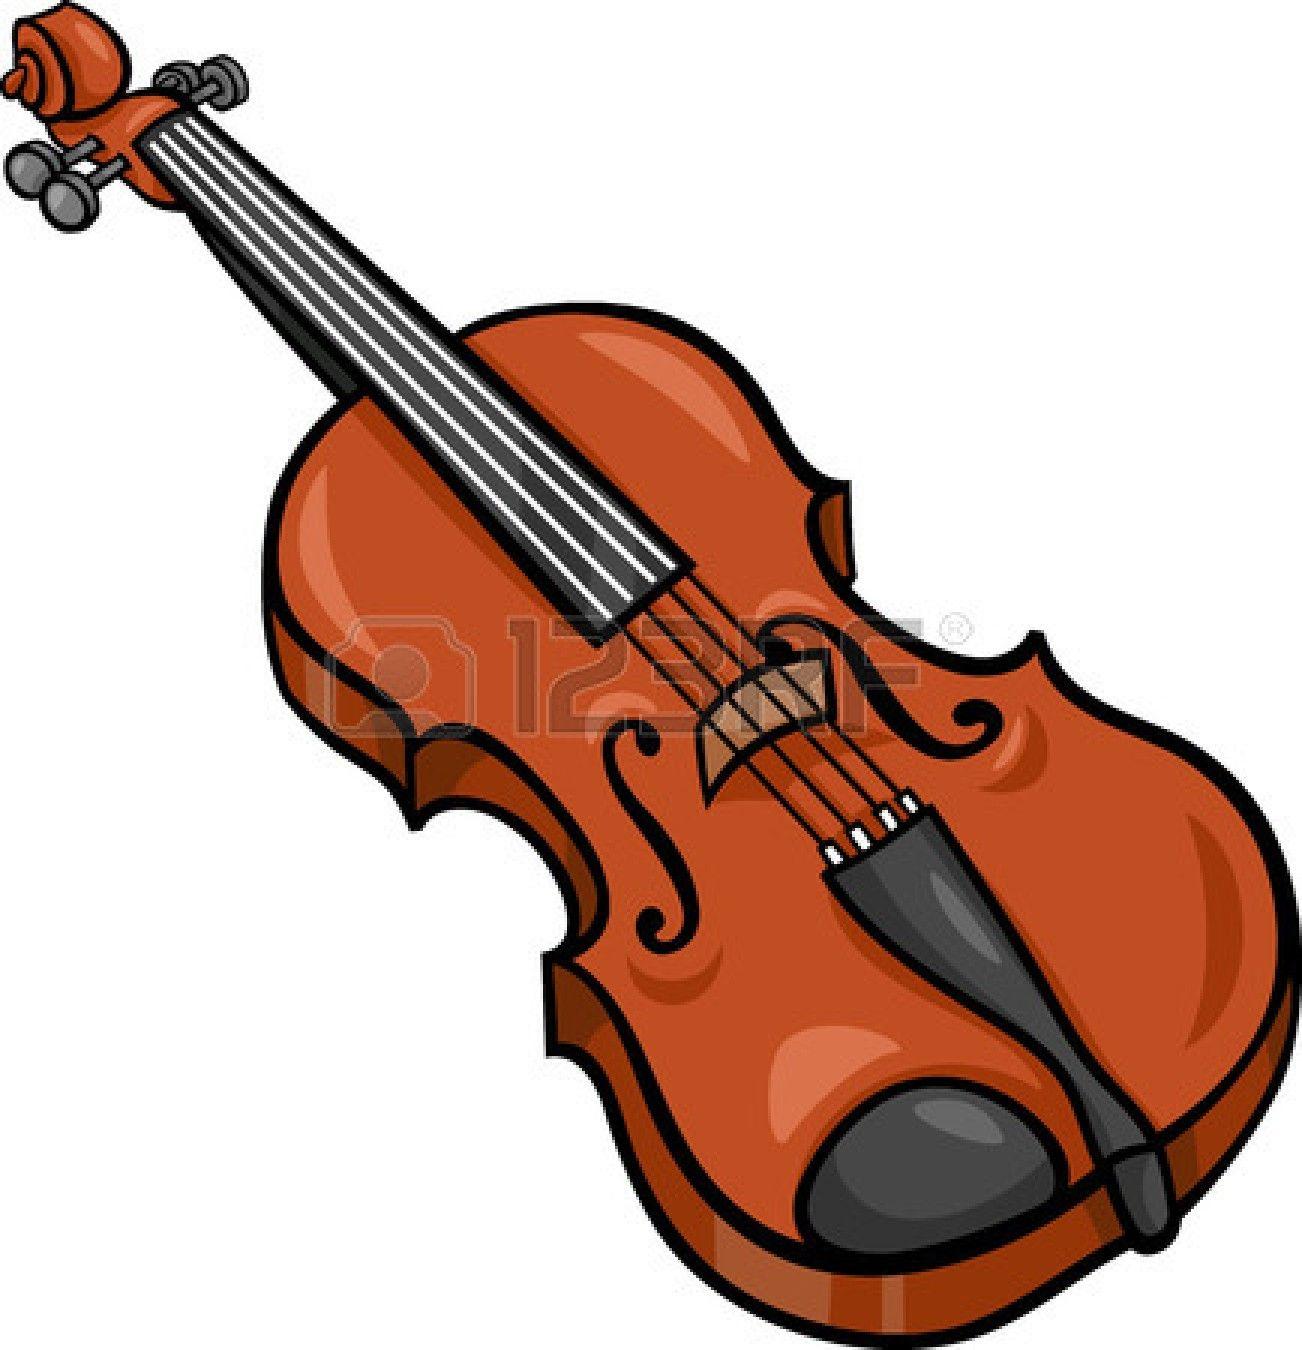 Cello clipart violin. With piano cartoon kid